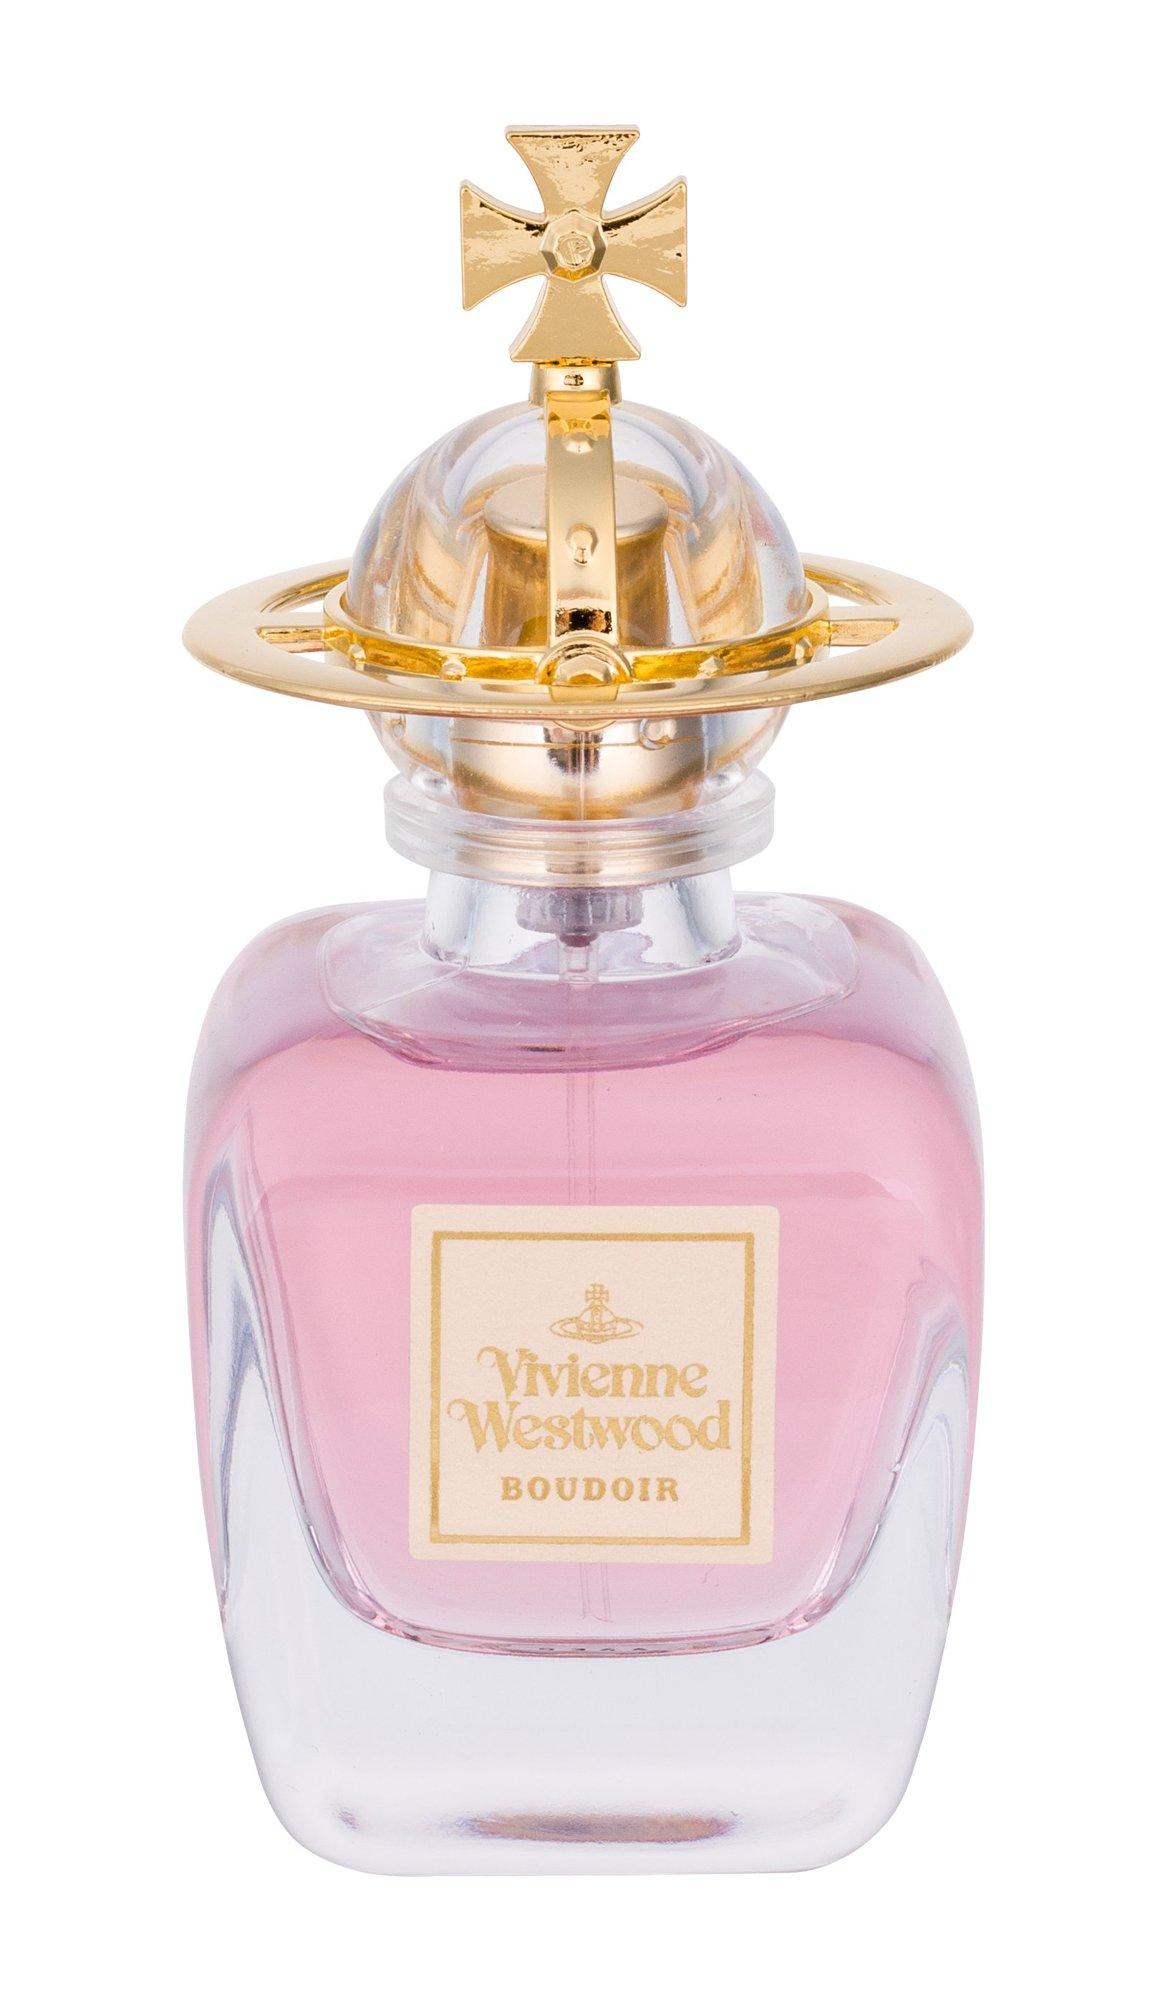 Vivienne Westwood Boudoir EDP 50ml